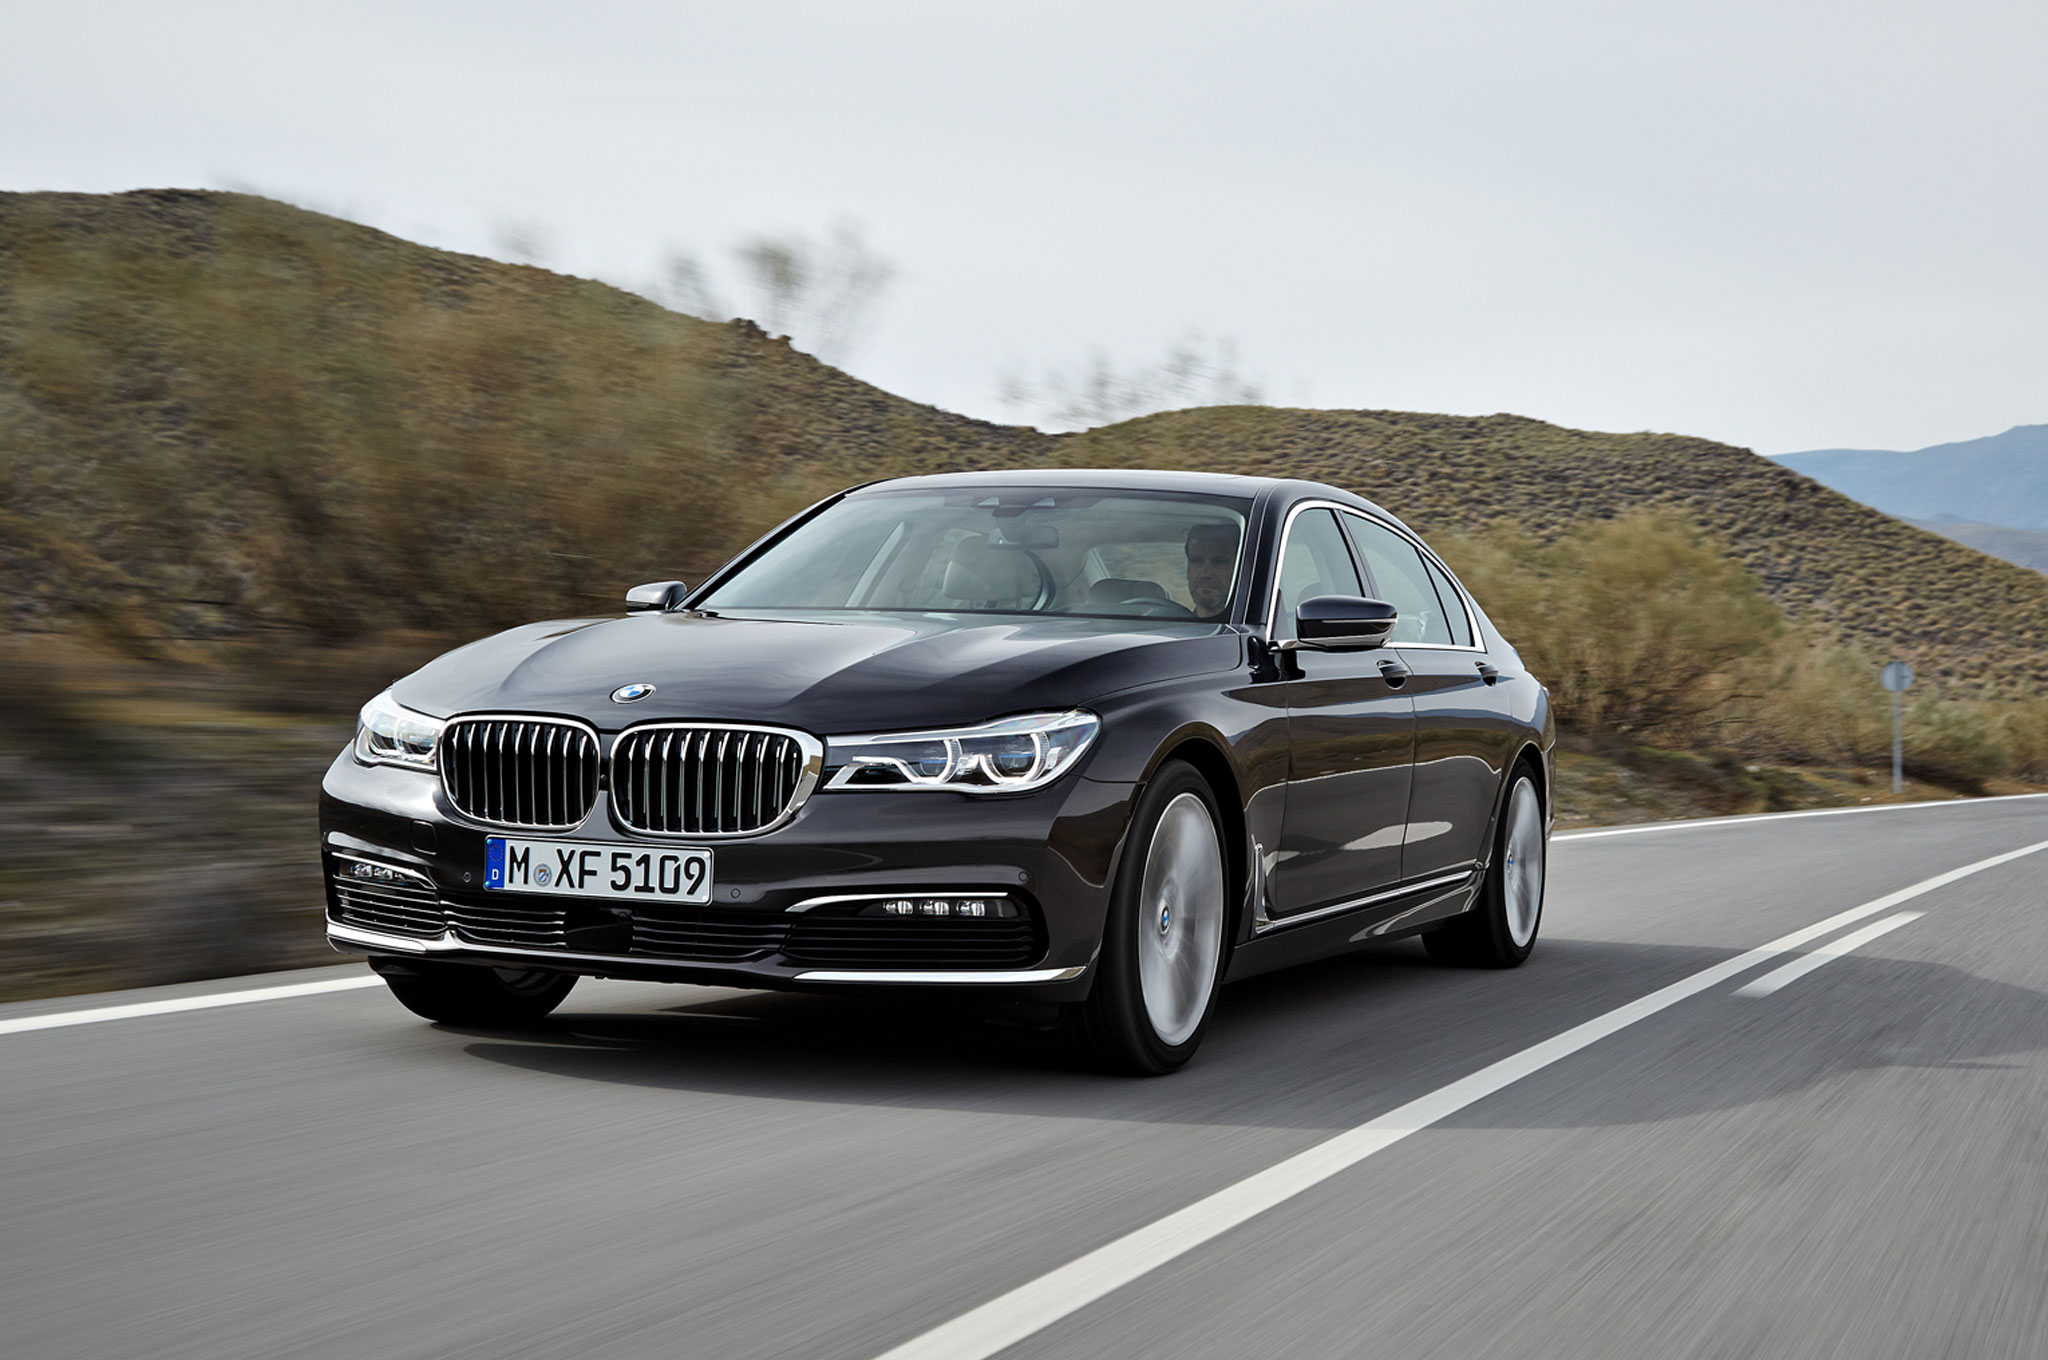 2016 BMW 750Li XDrive Lead